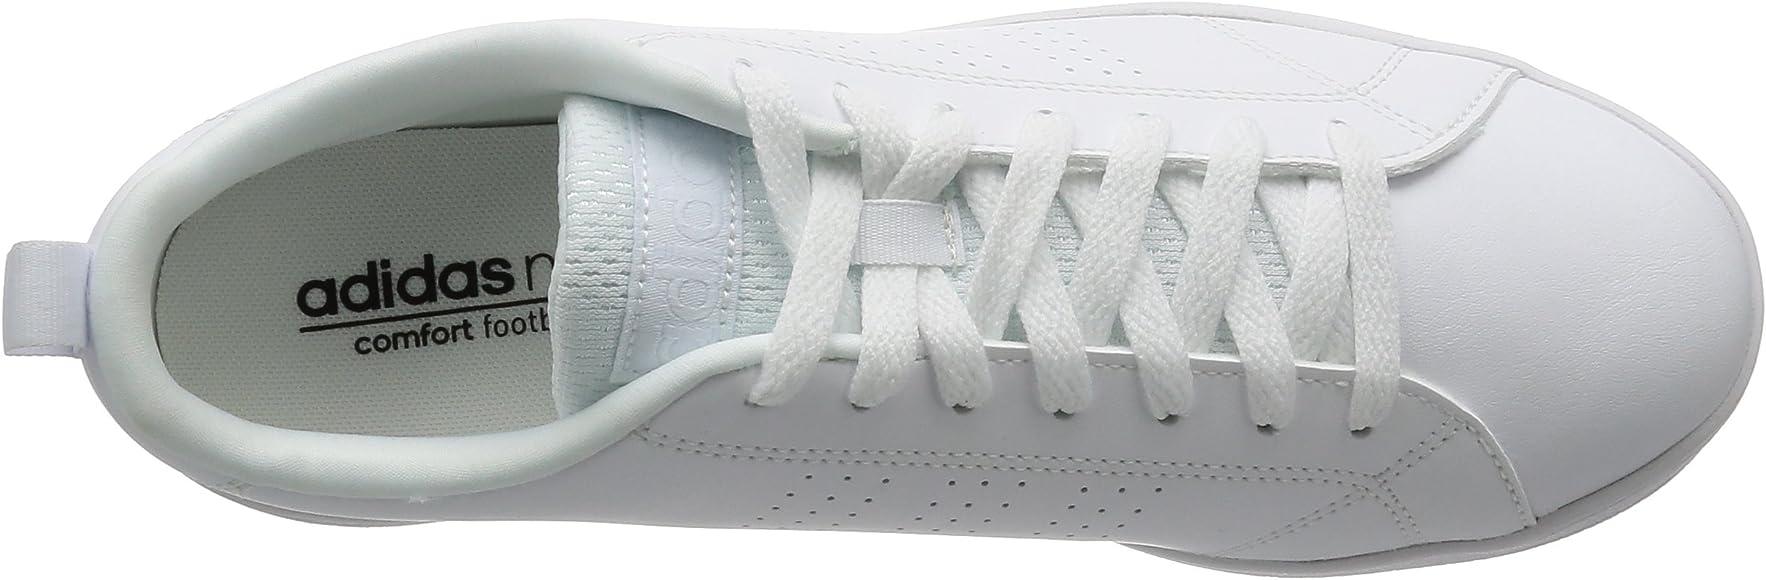 adidas way one 2019